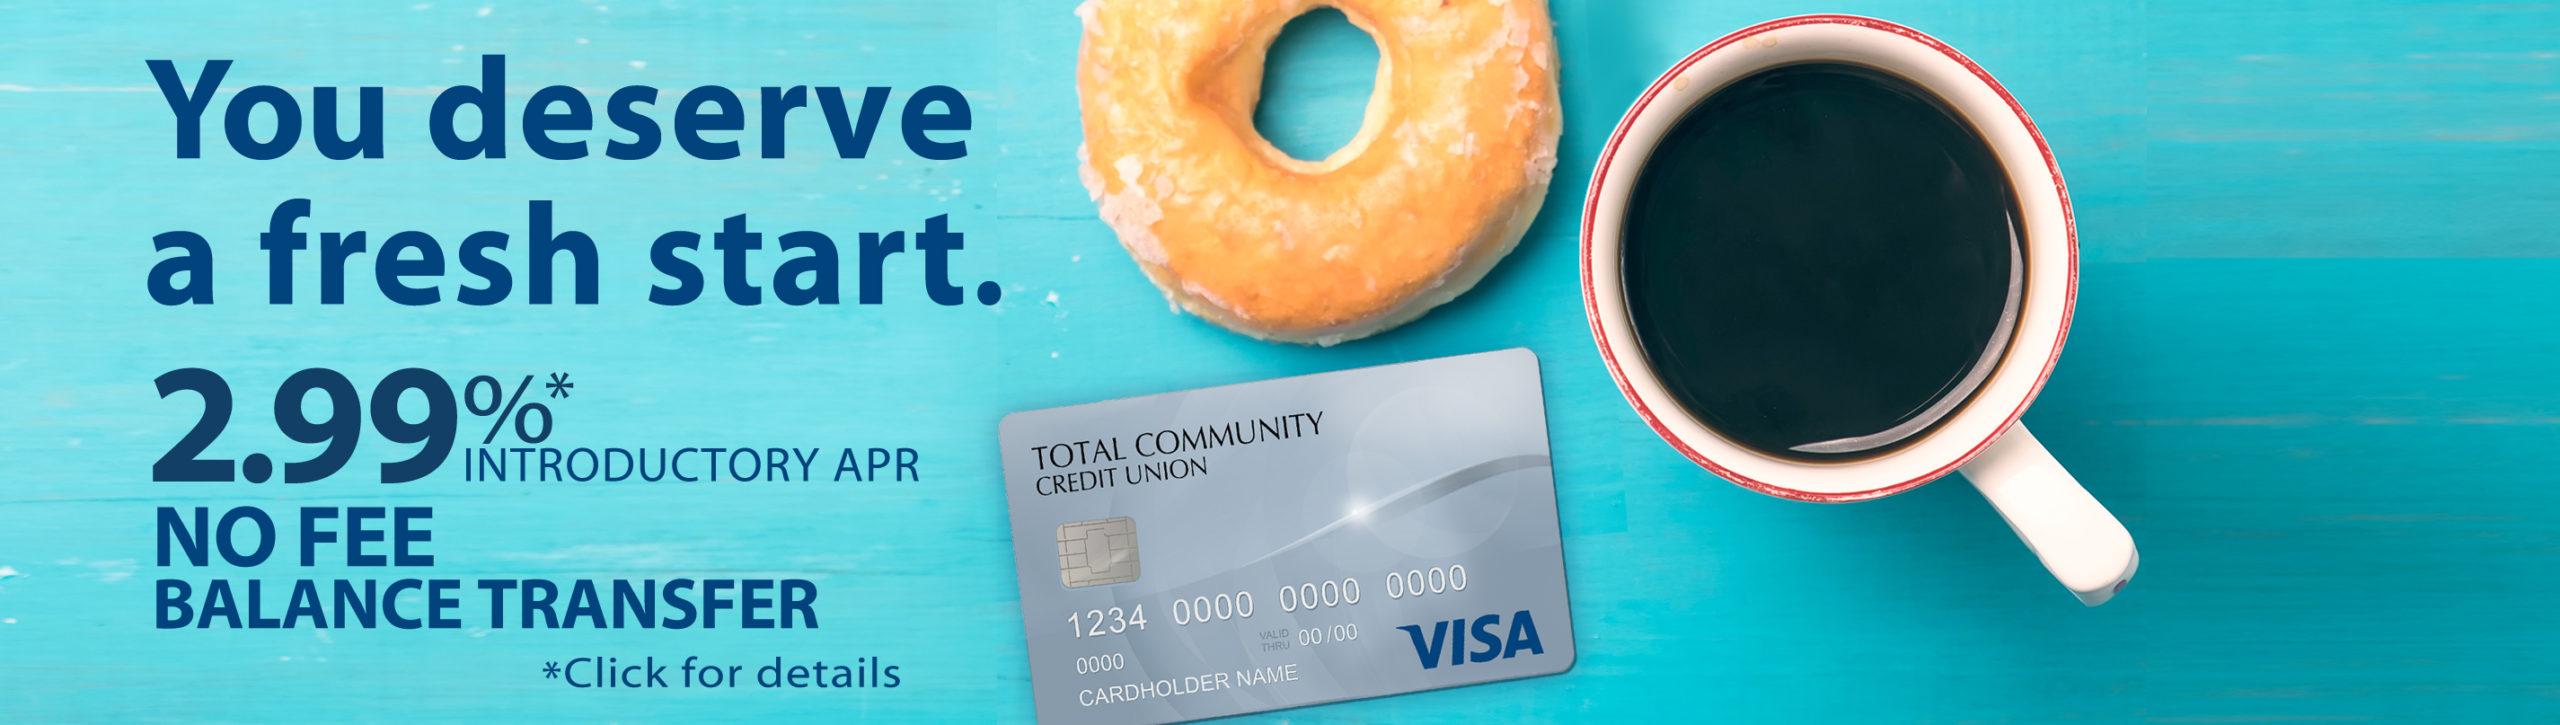 You deserve a fresh start. 2.99% introductory apr* Visa